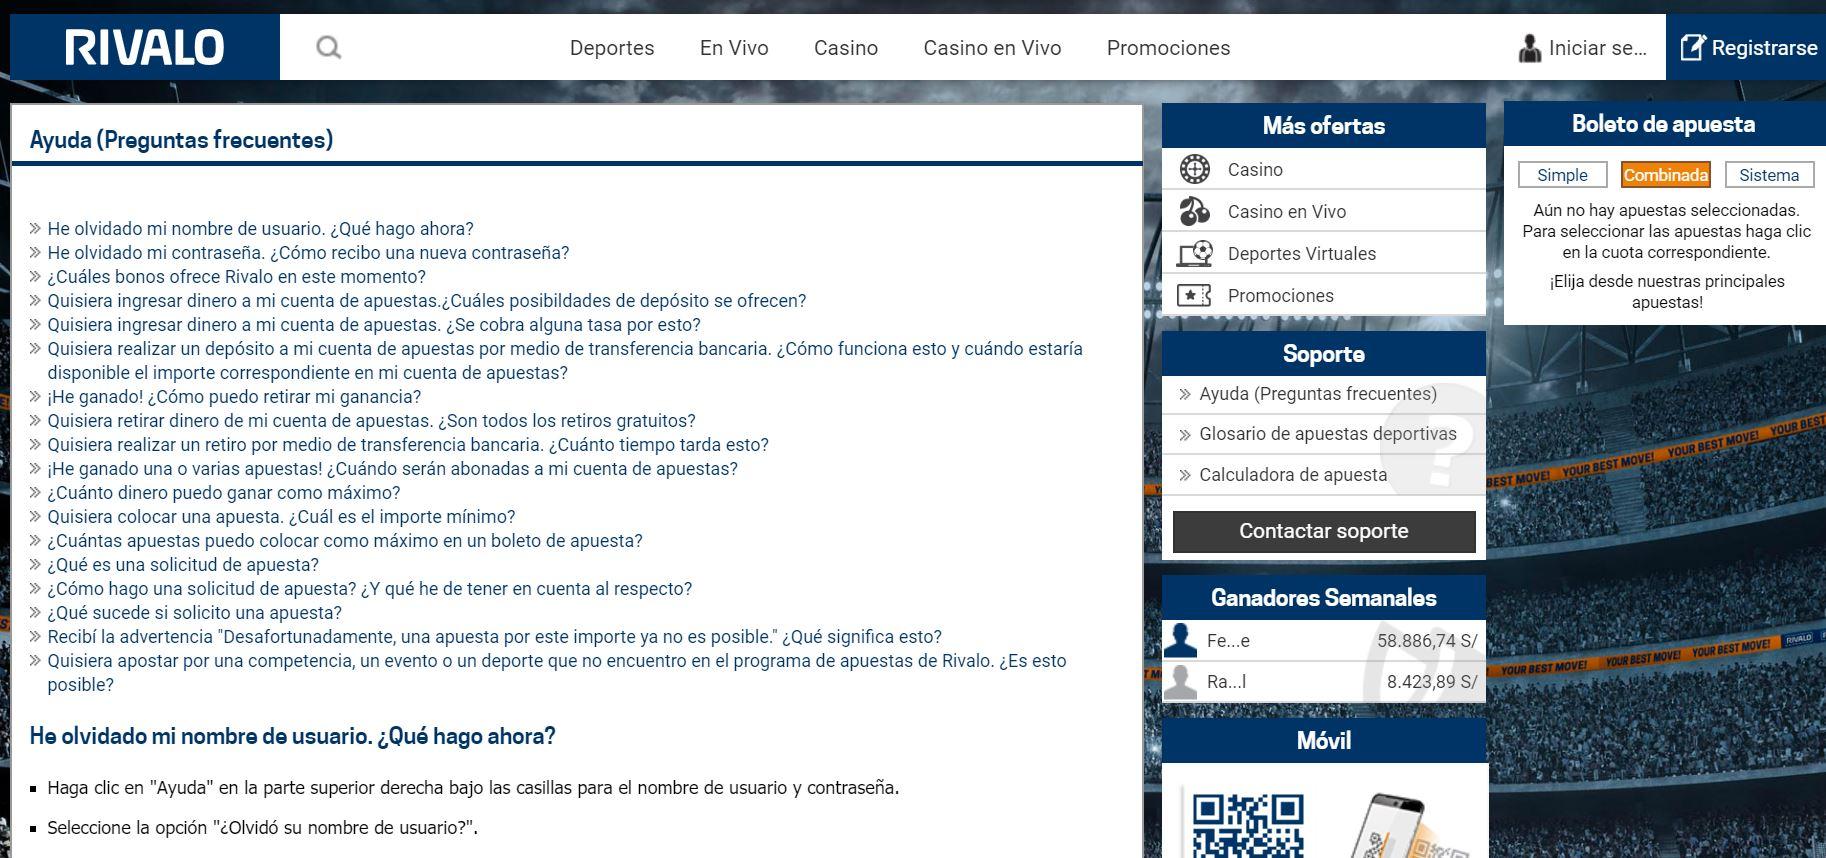 Preguntas Frecuentes Rivalo Chile